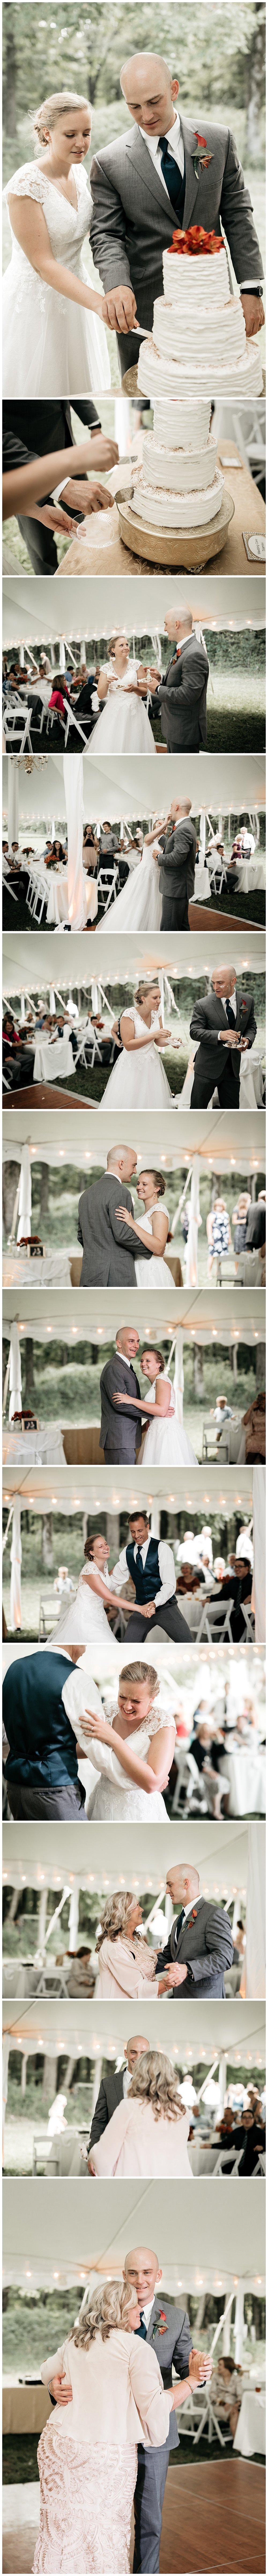 grovecitypabackyardweddingweddingphotographer_0015.jpg